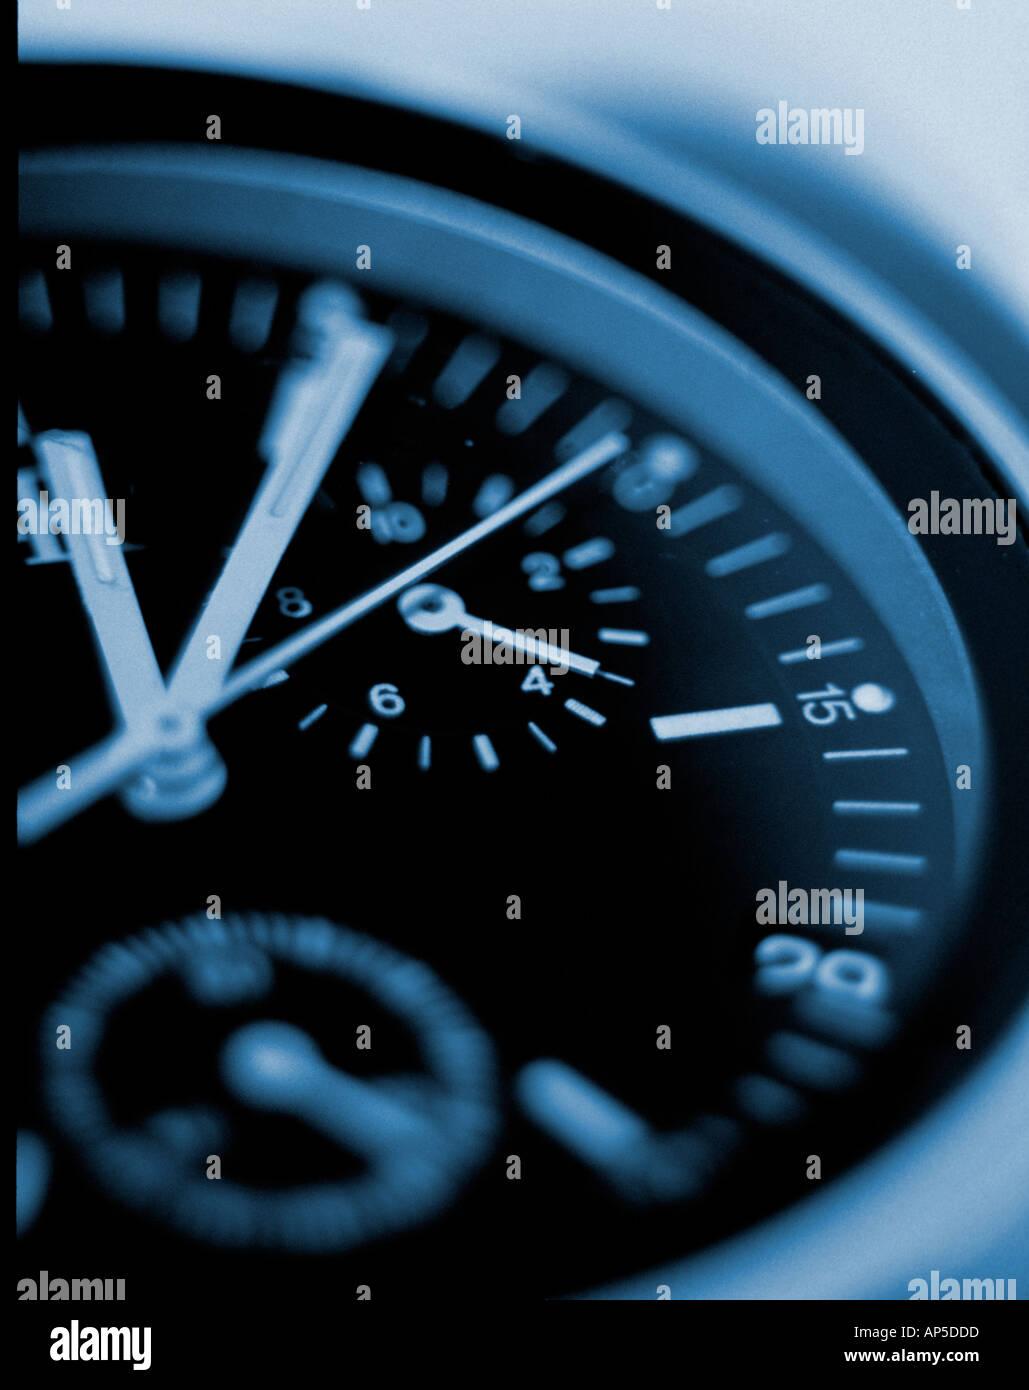 Chronograph Clock - Stock Image